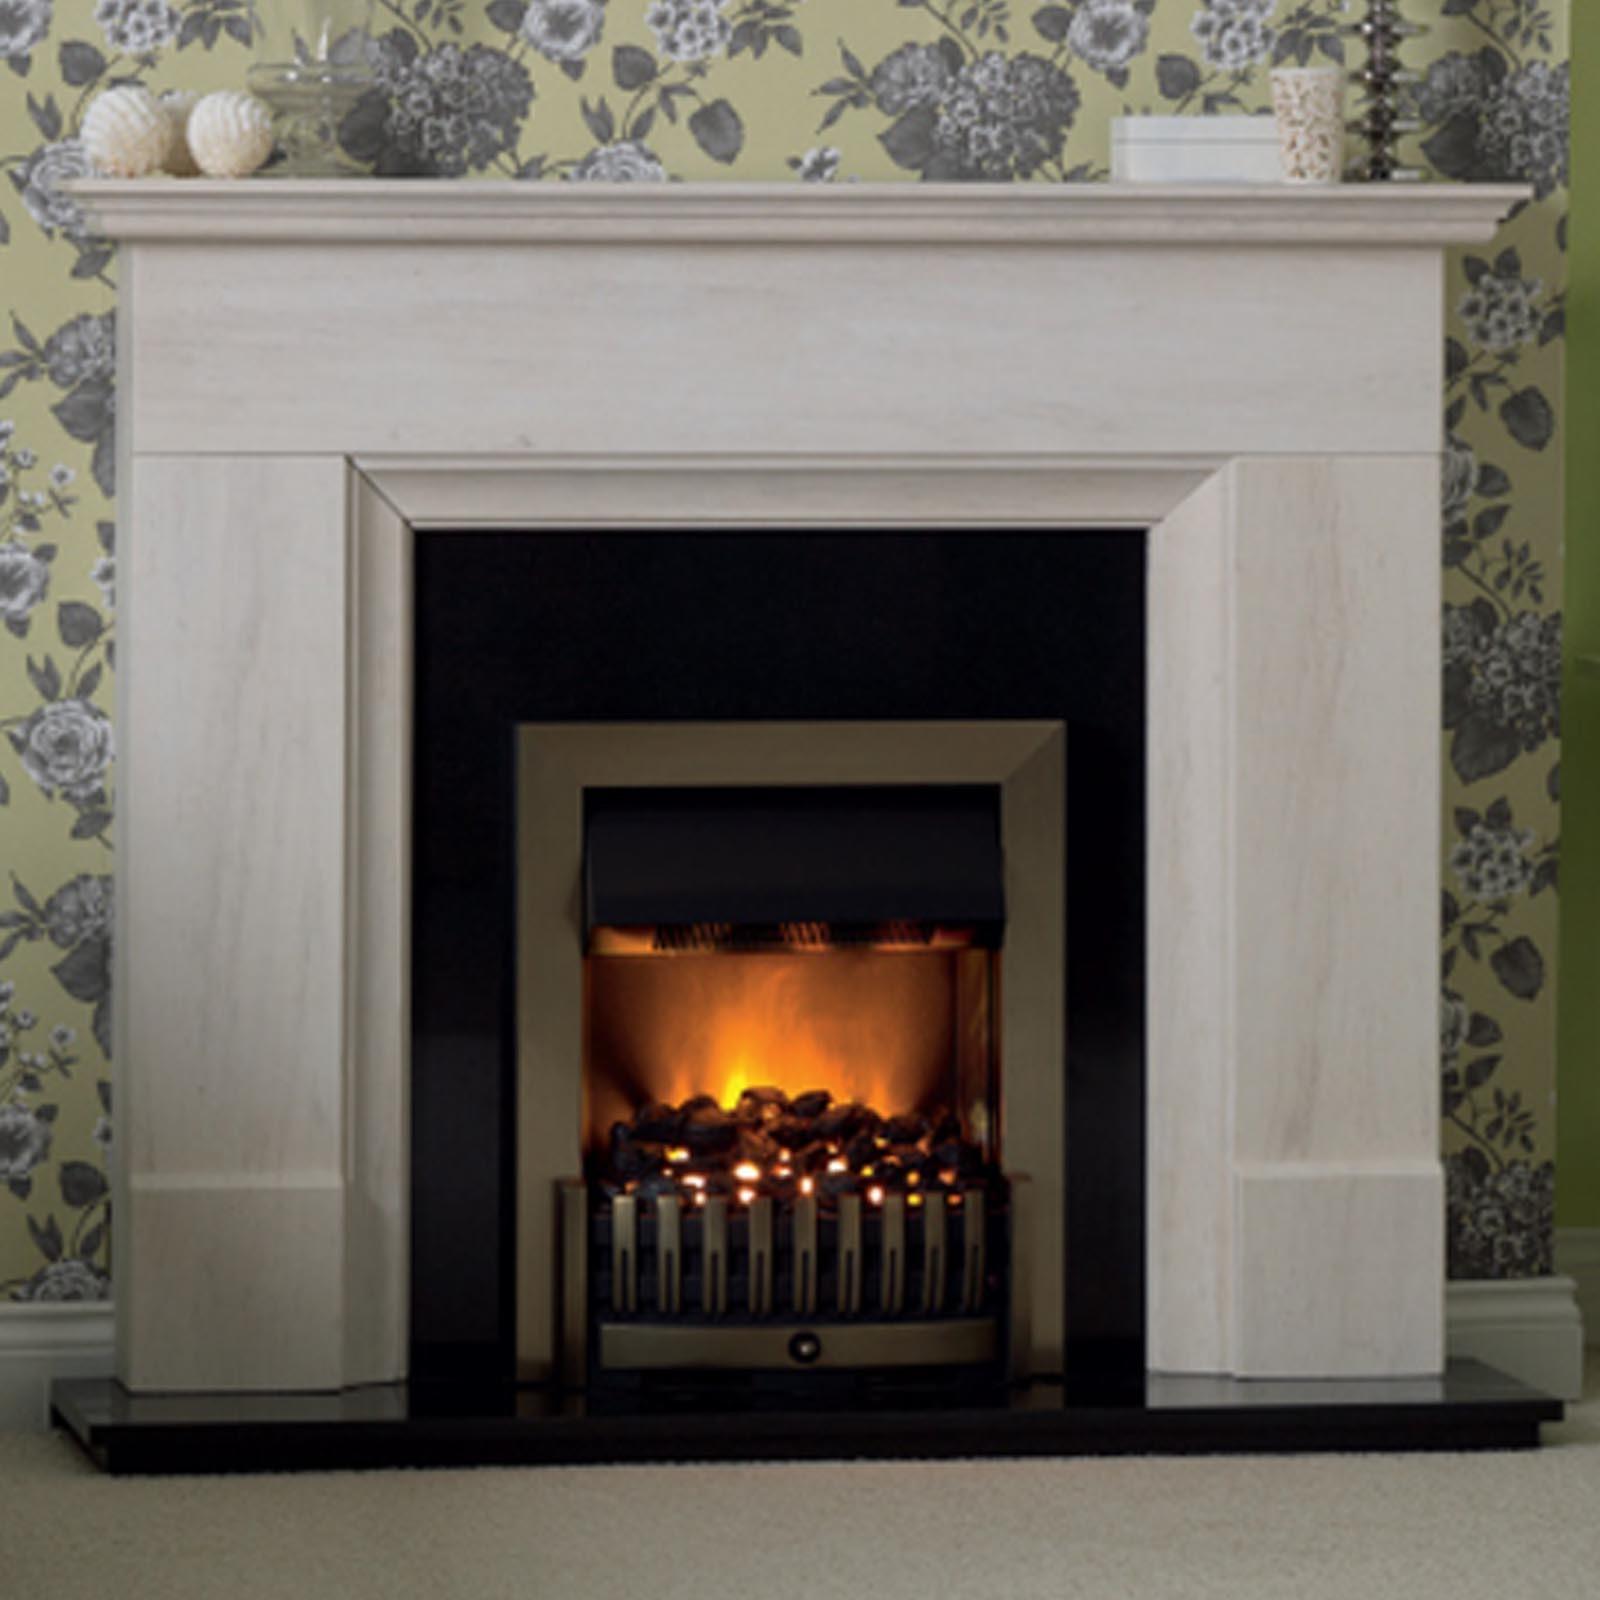 fire electric granite new opti burbank myst fireplace stonehenge dimplex optimyst fireplaces black